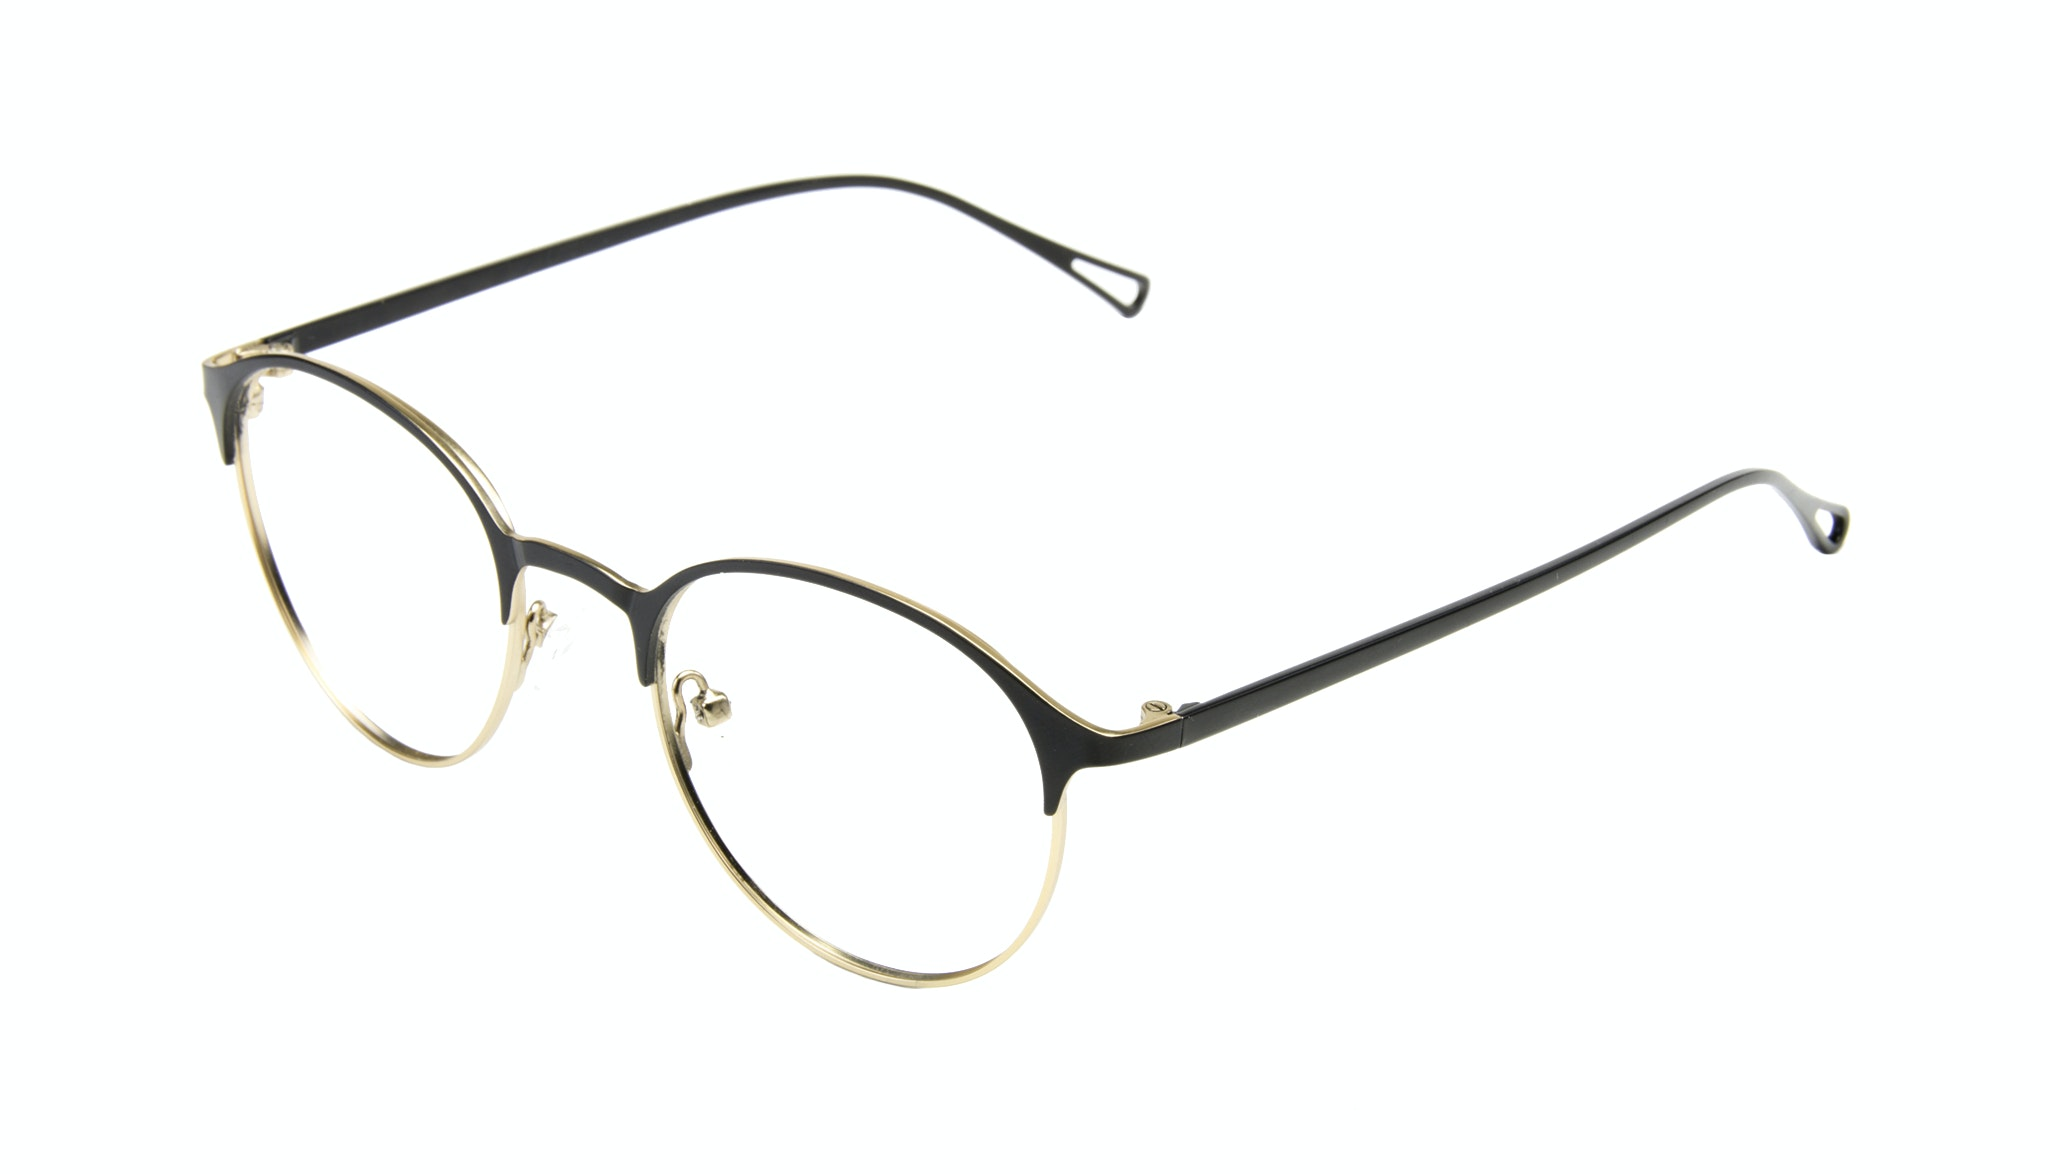 Affordable Fashion Glasses Round Eyeglasses Women Bay Deep Gold Tilt